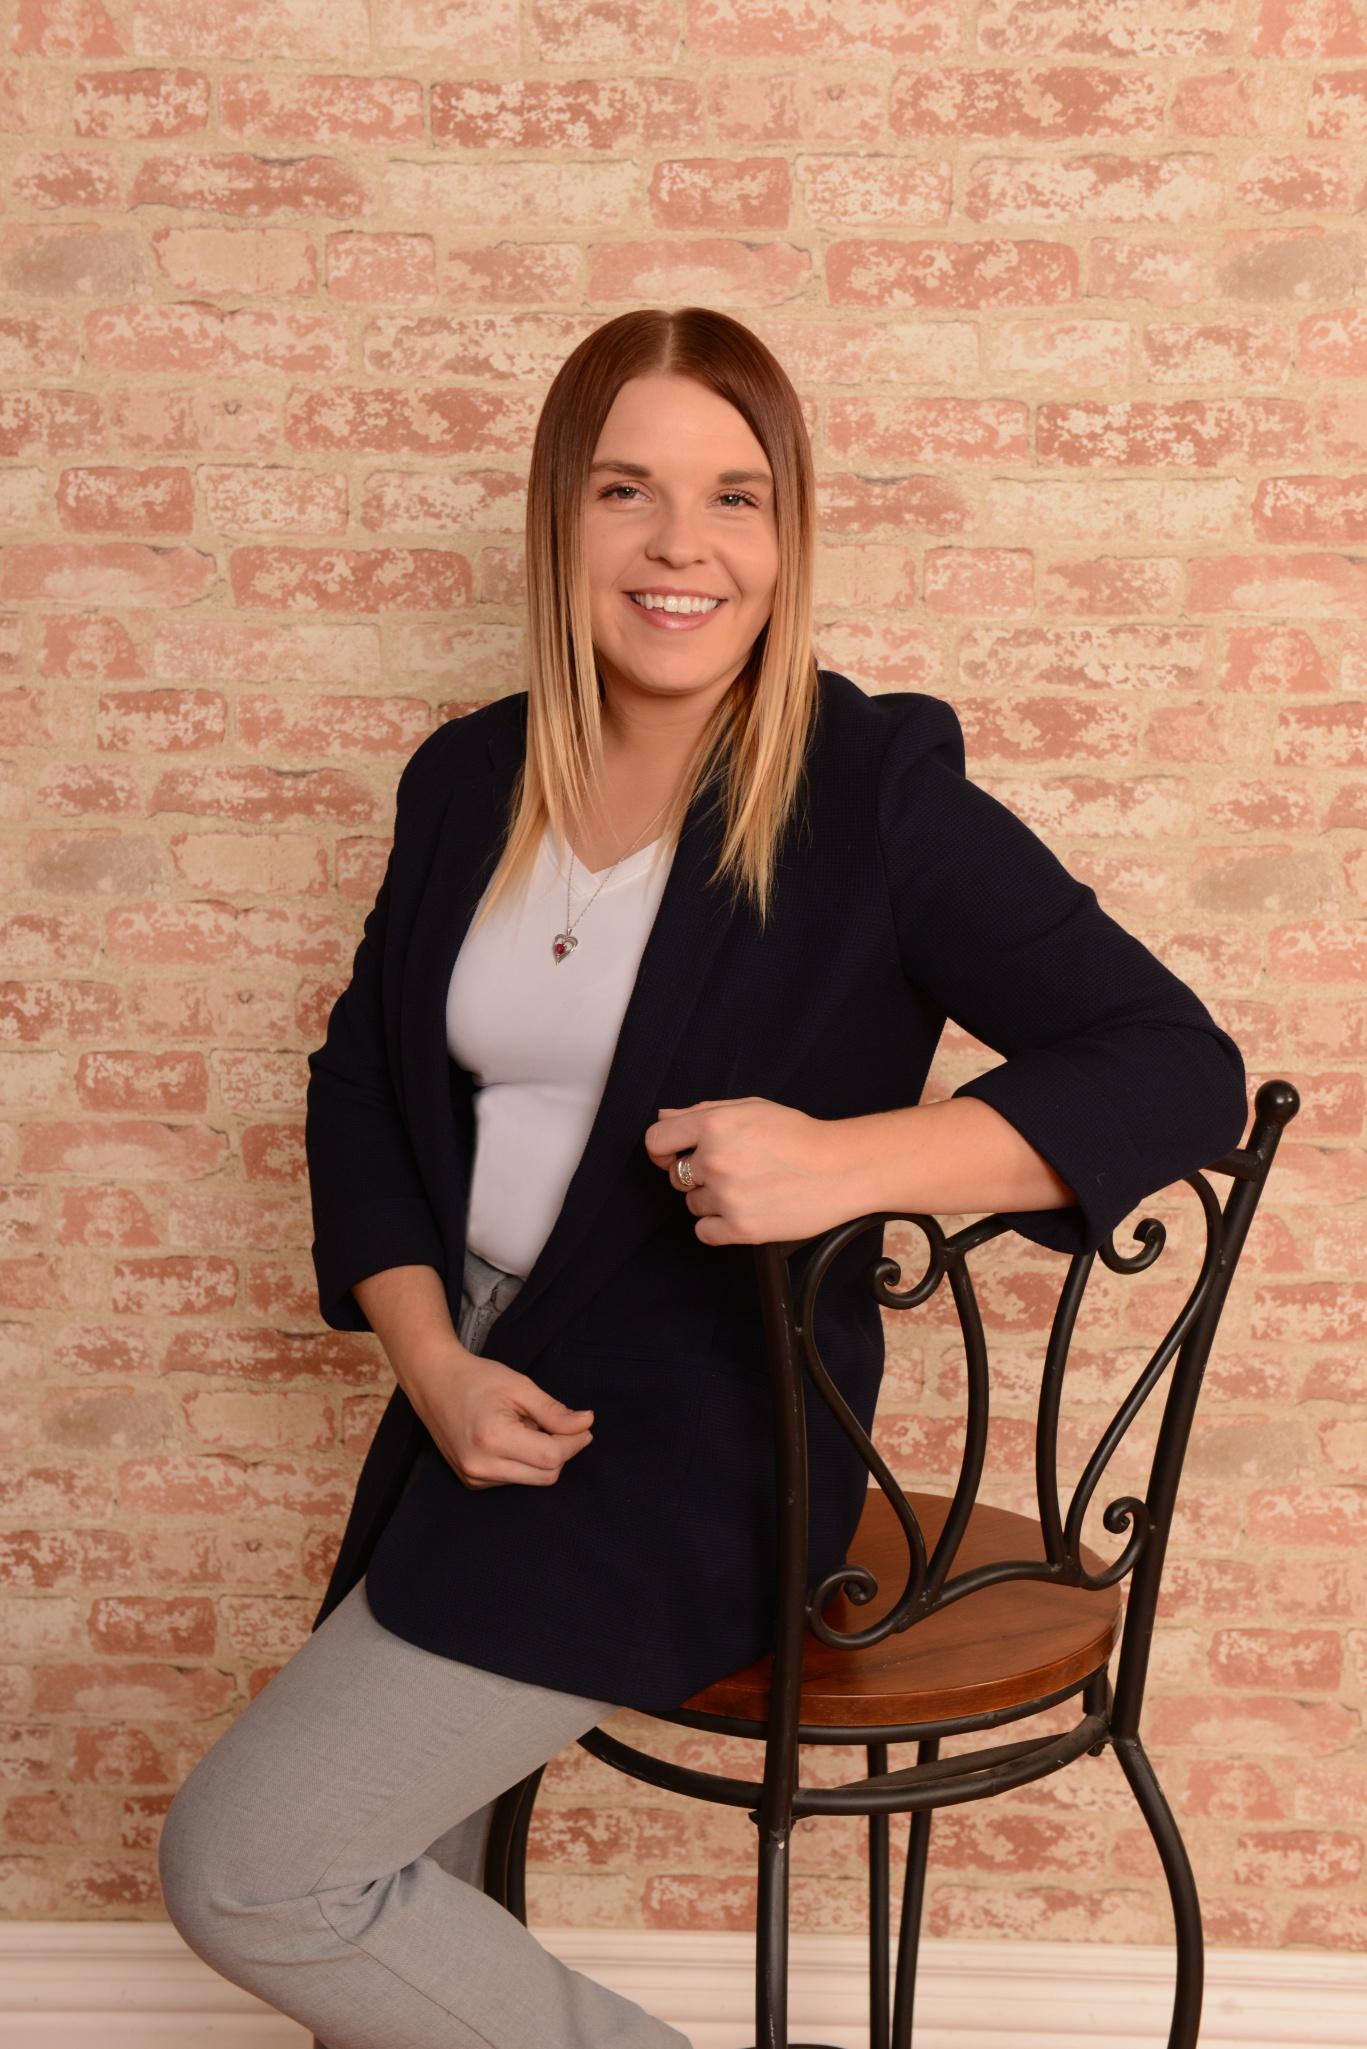 Headshot of Realtor Jacqueline Stoll